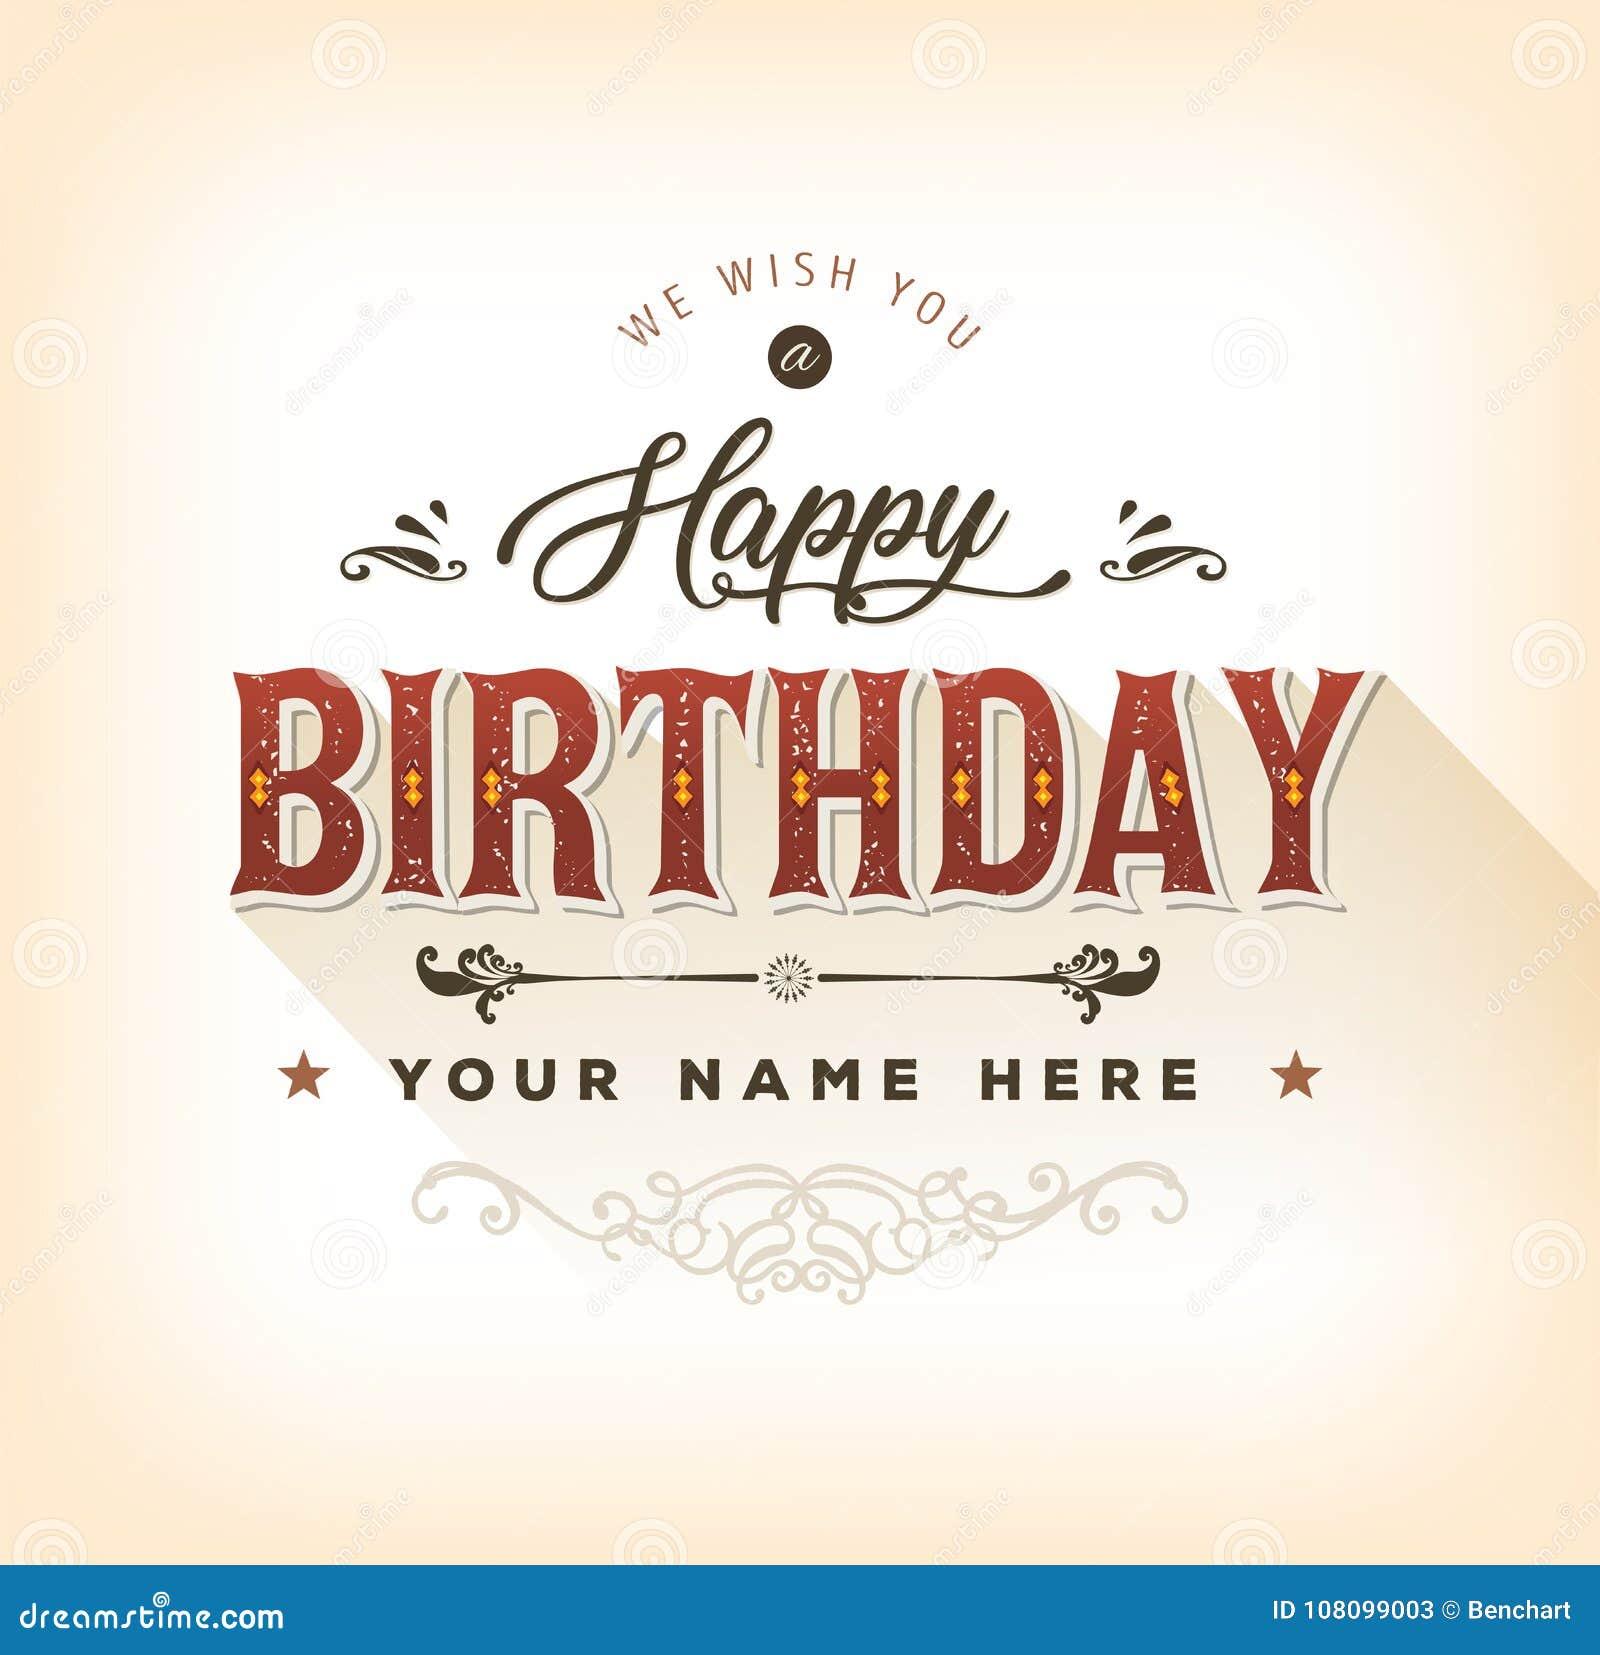 Vintage Happy Birthday Card Stock Vector Illustration Of Greetings